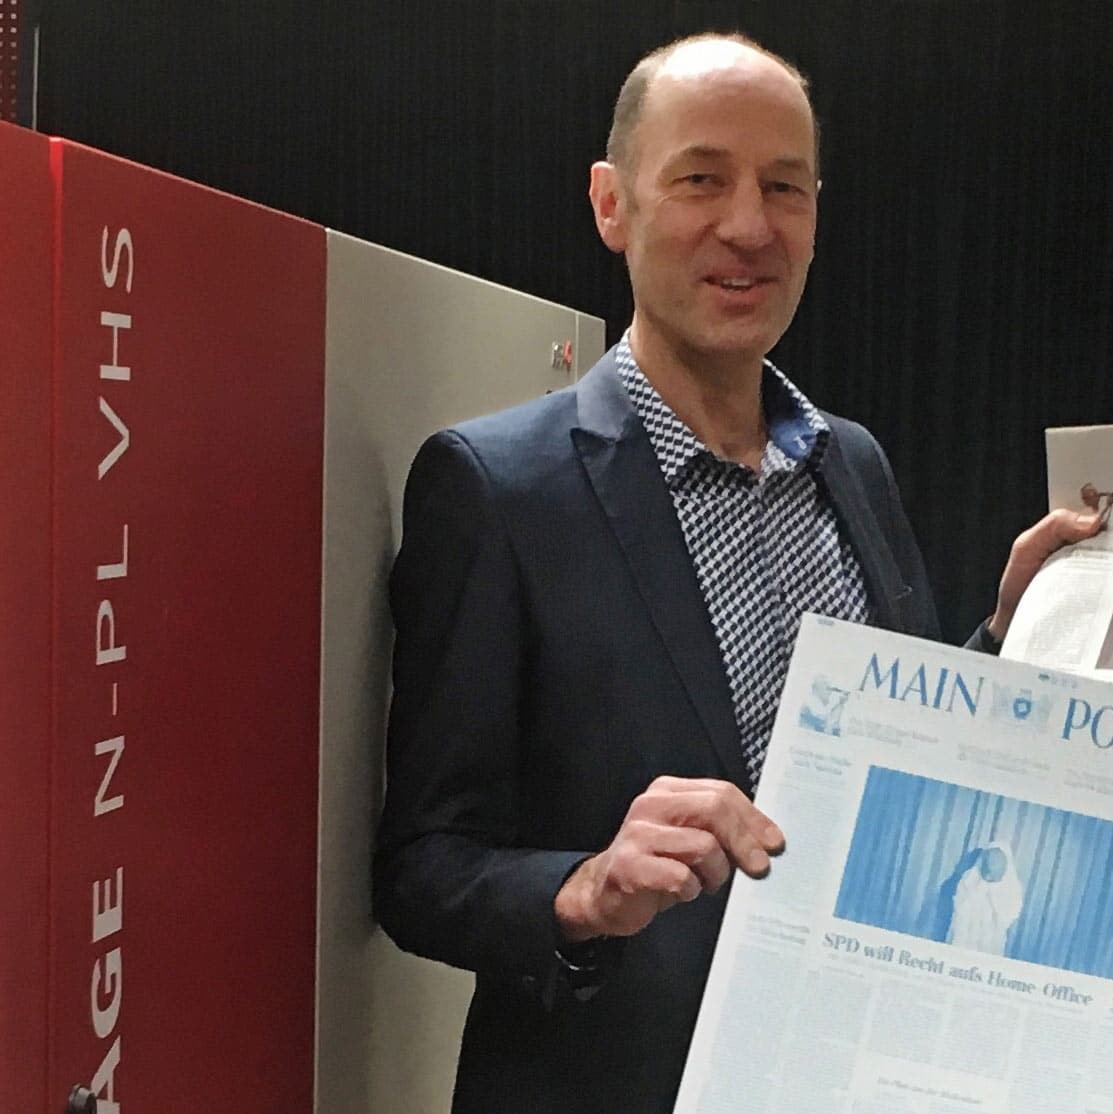 Andreas Kunzemann - Media Group Main-Post